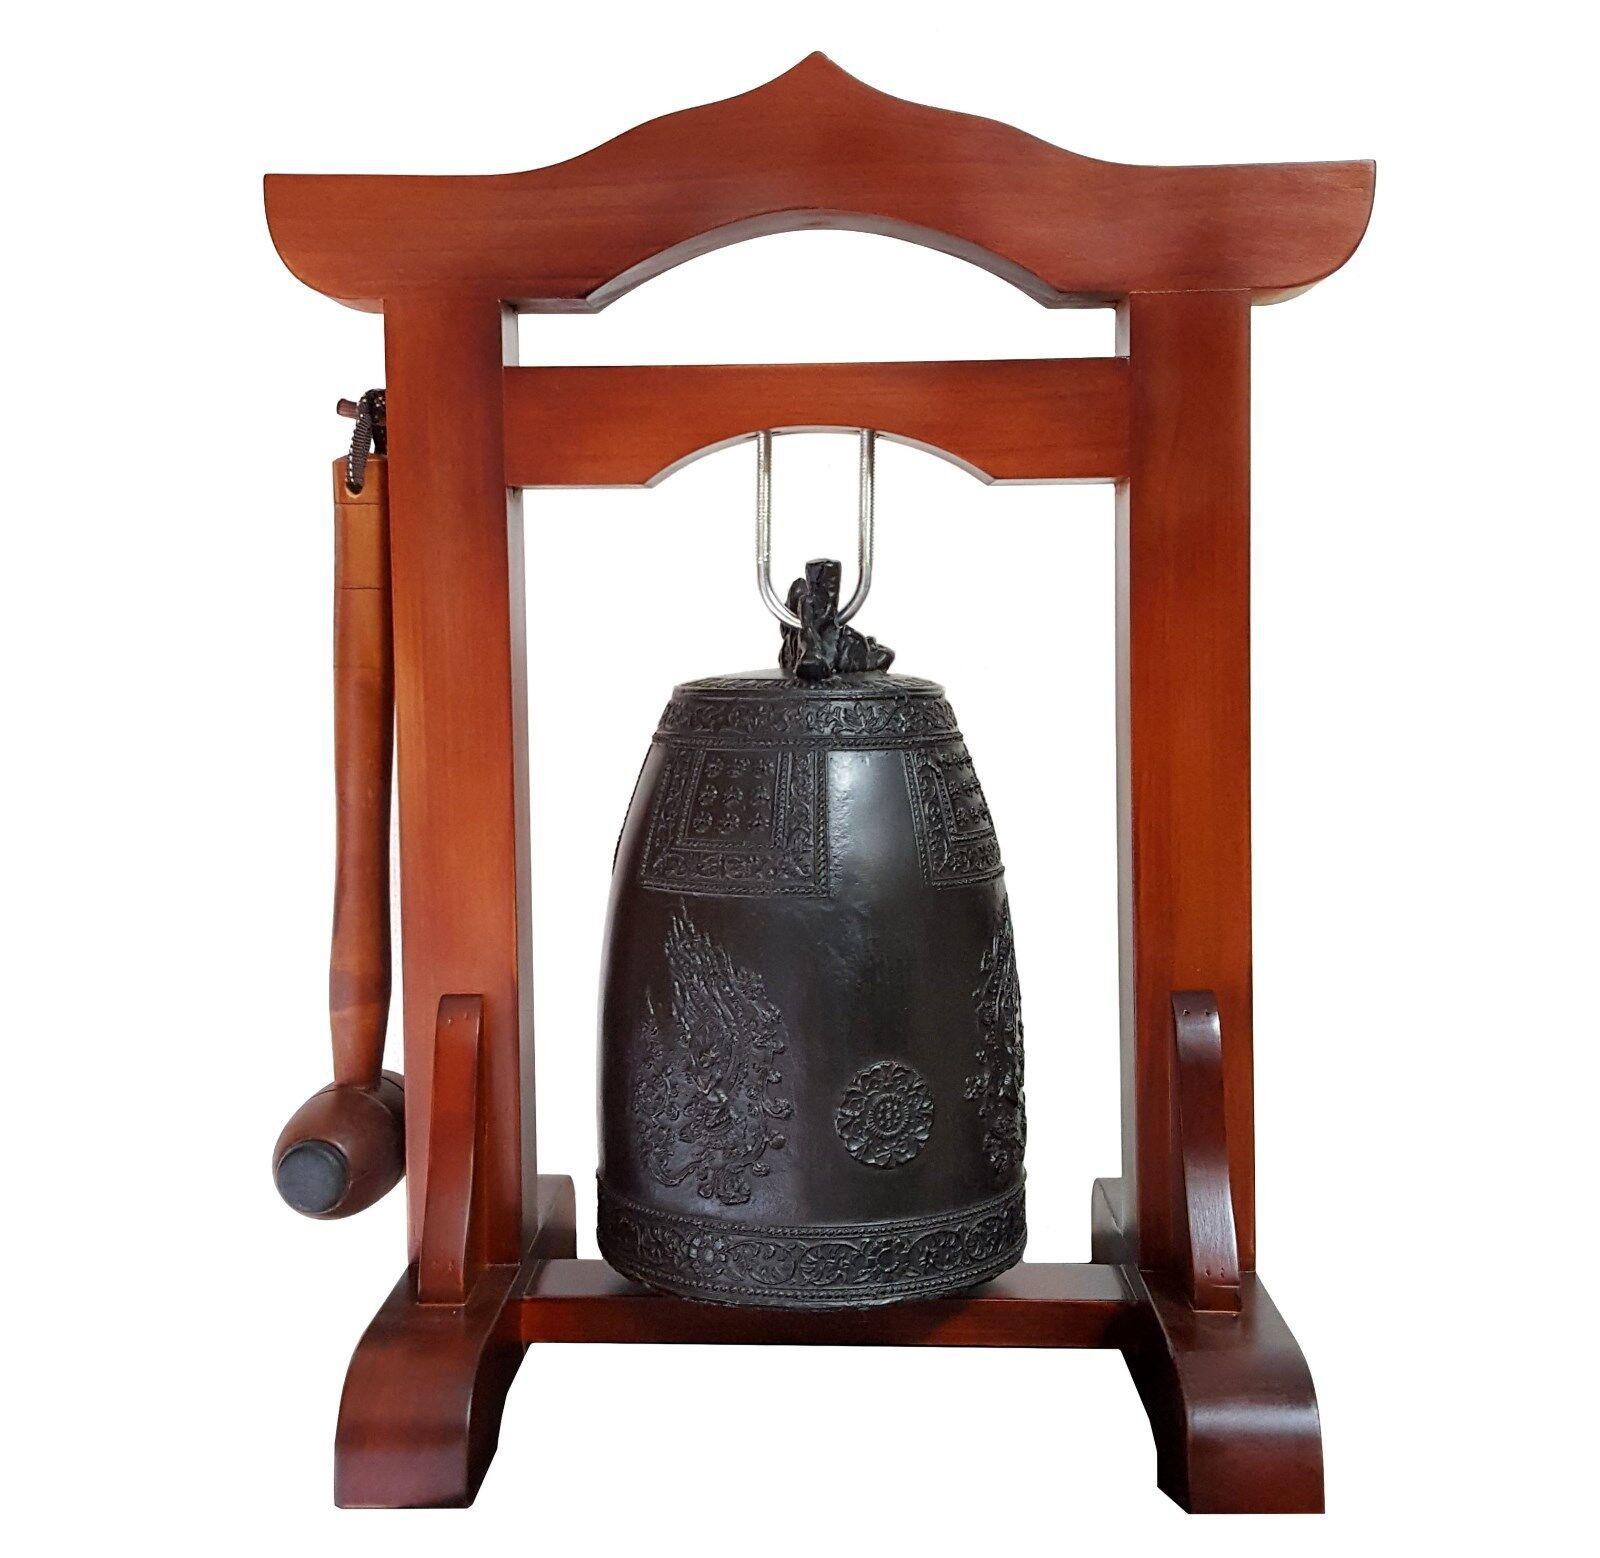 KOREAN BUDDHIST TEMPLE BELL  BUMJONG   BRONZE BELL INDOOR TEMPLE BELL 1KAN   1